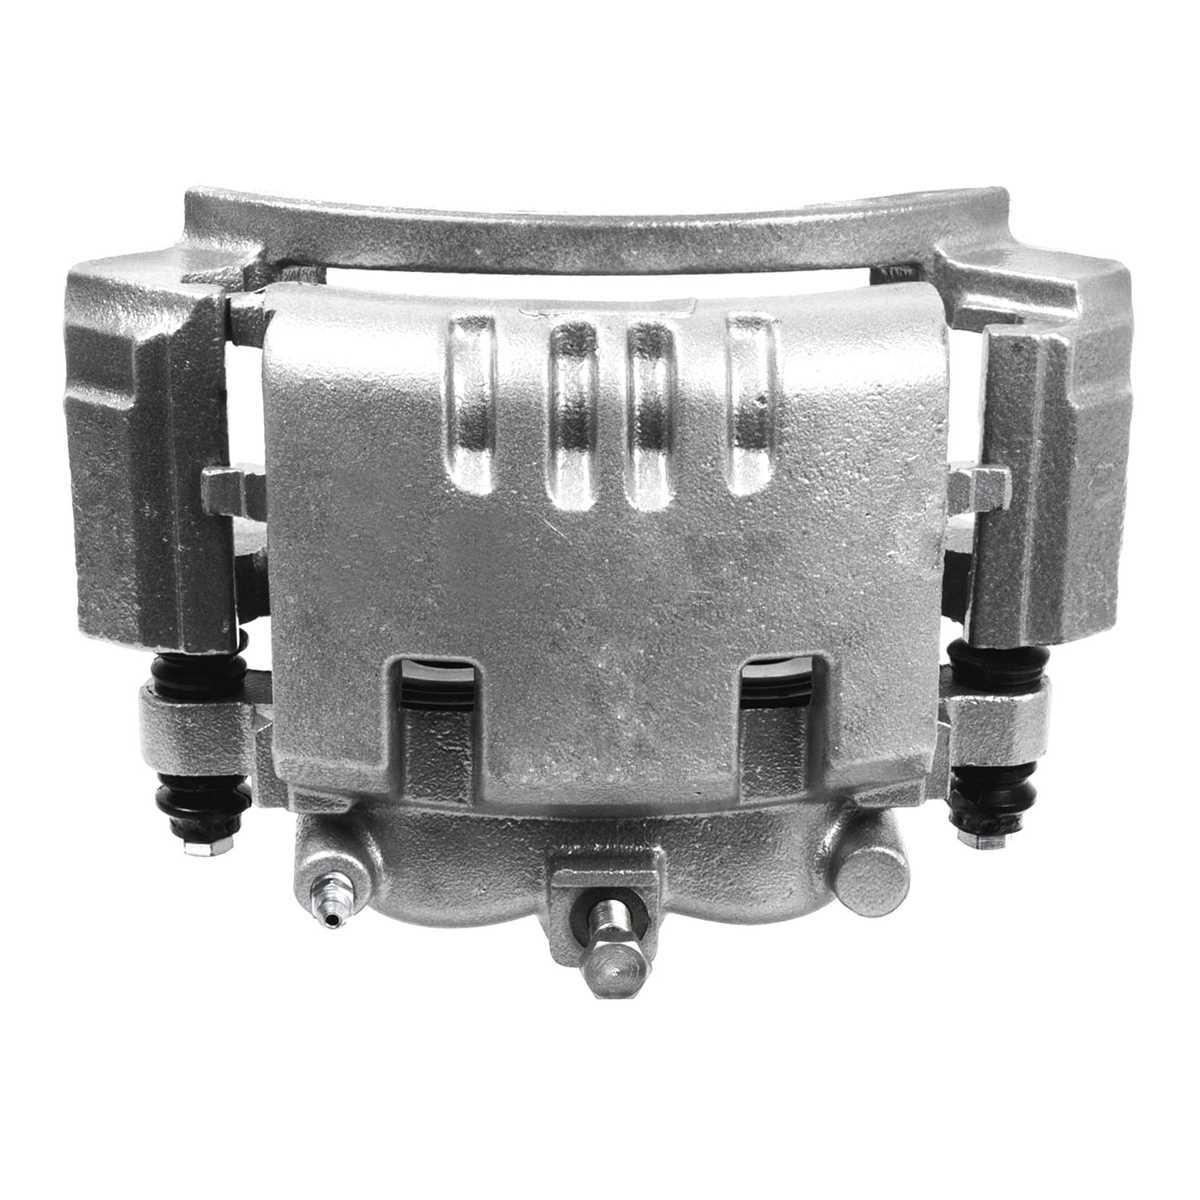 Prime Choice Auto Parts BC2873 Rear Passenger Side Brake Caliper